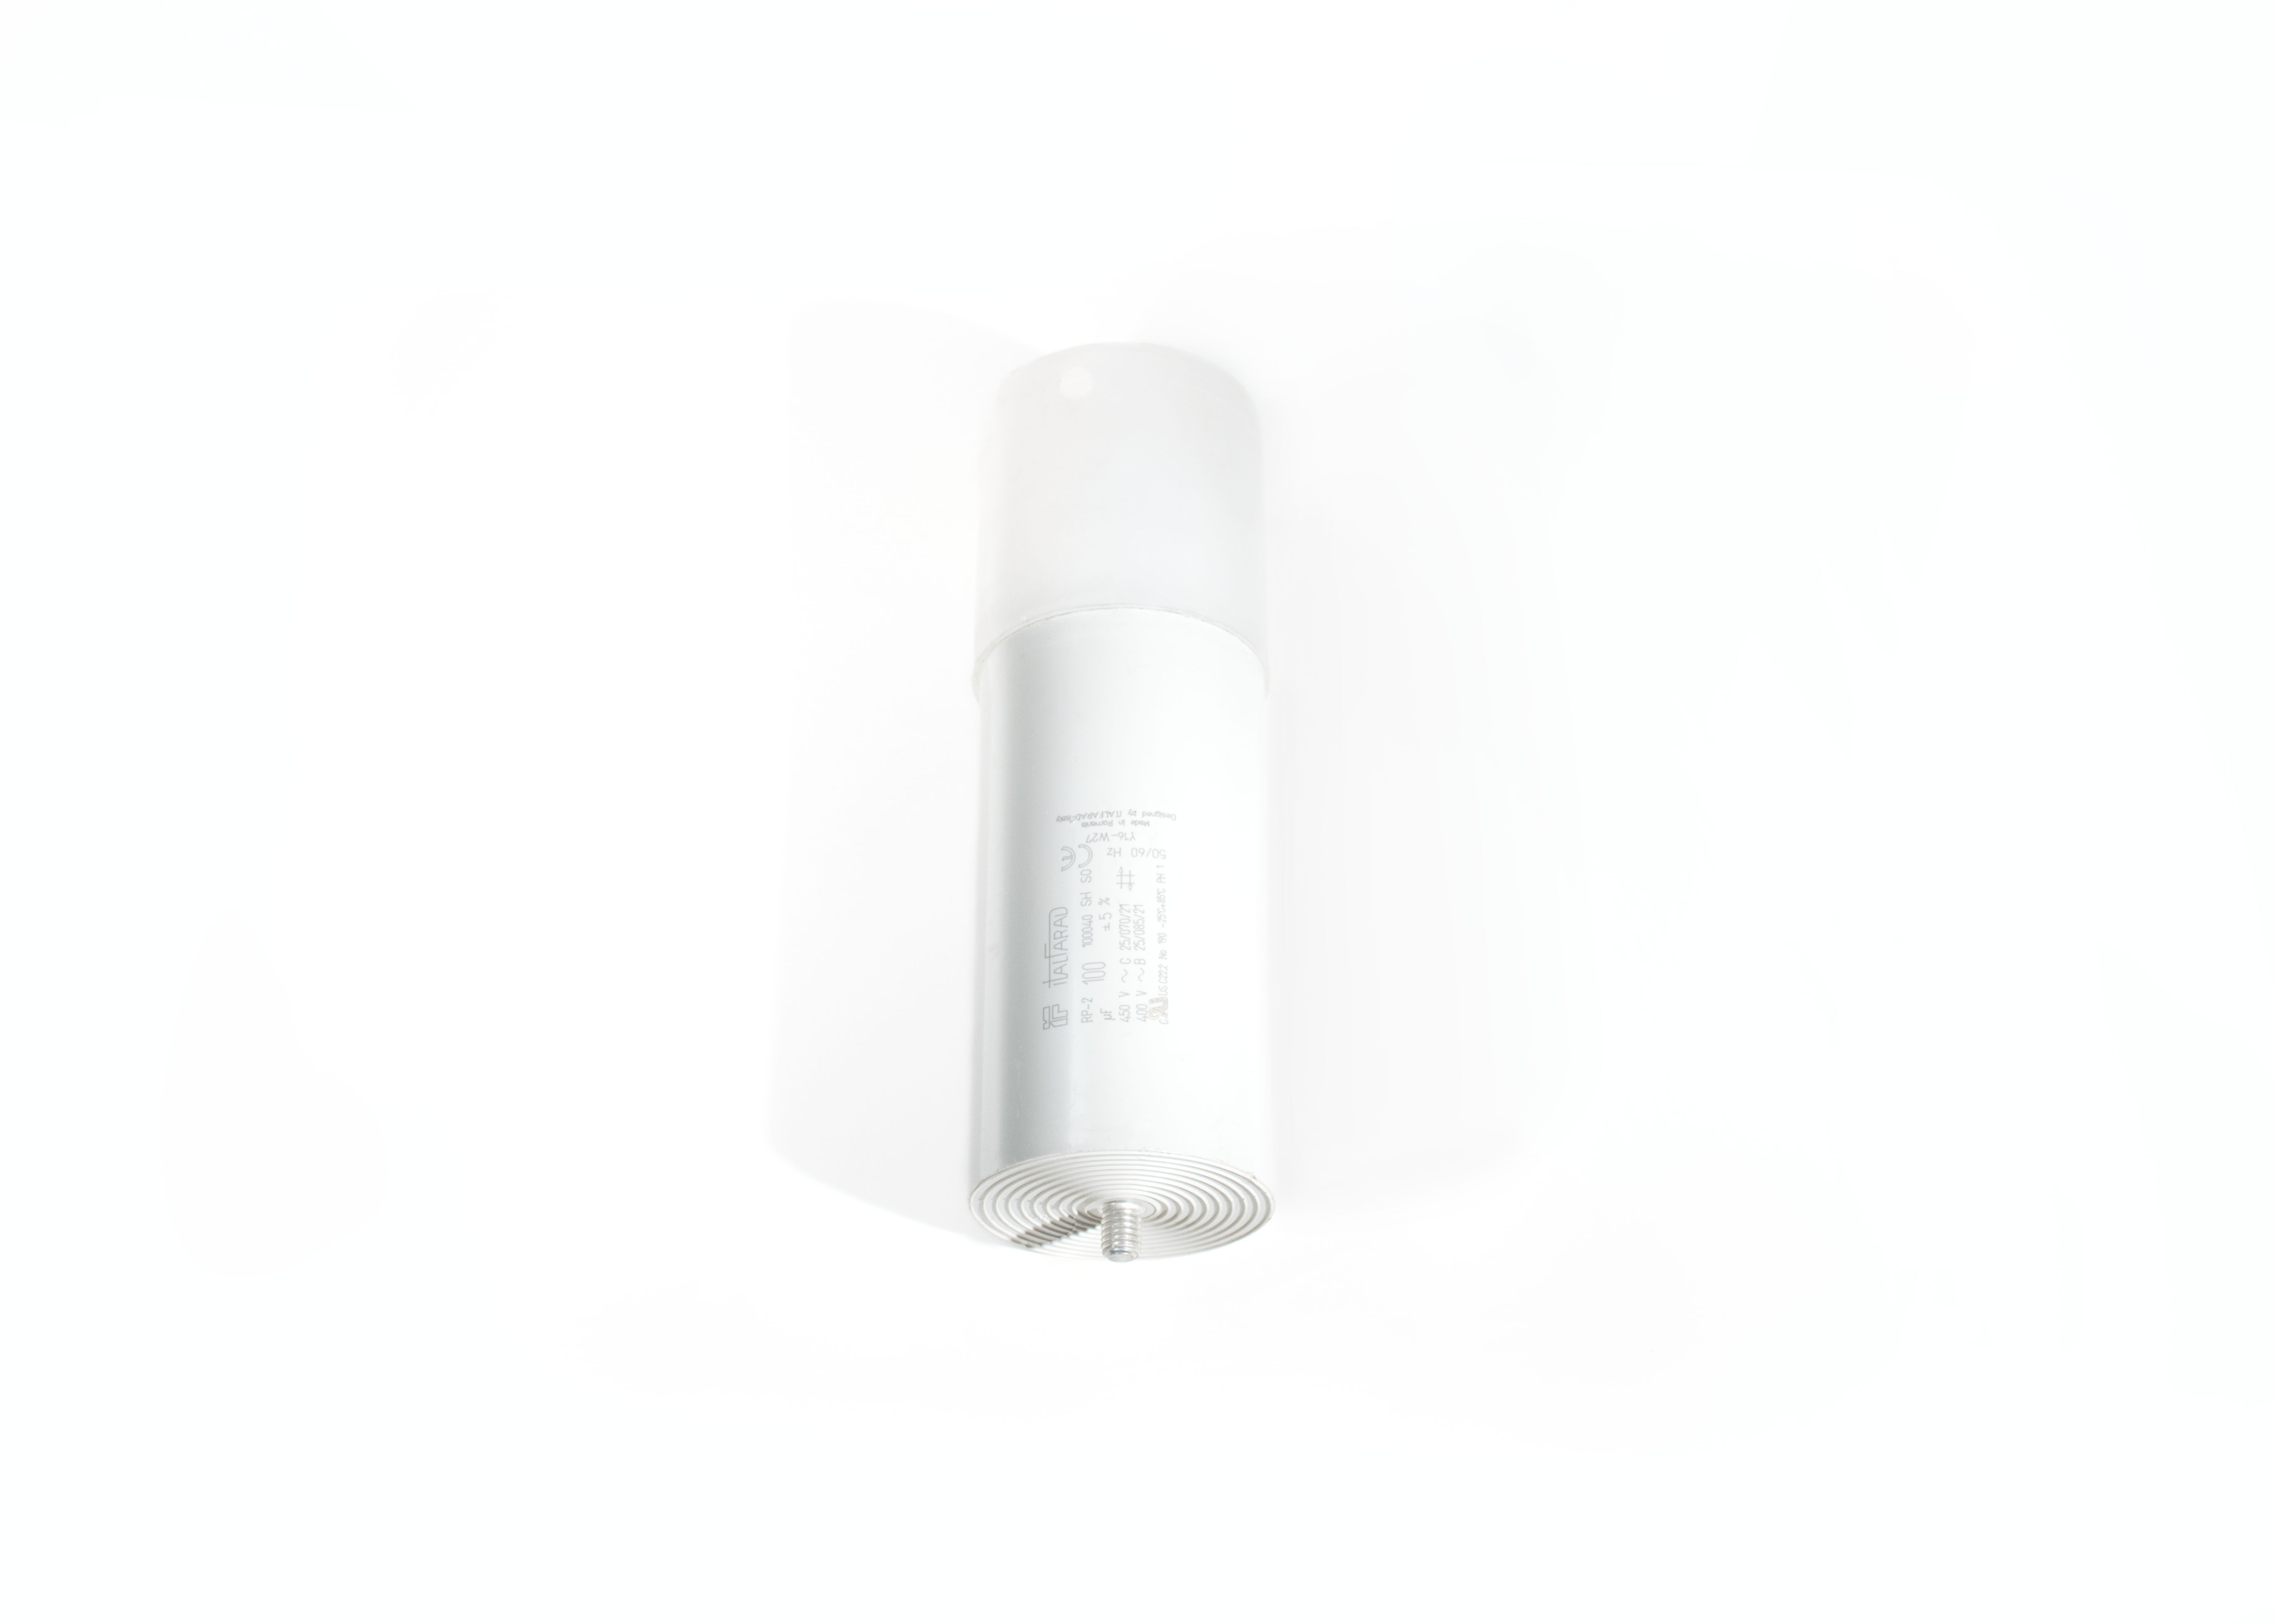 Capacitor (100 mf) OLS# 638187 Image